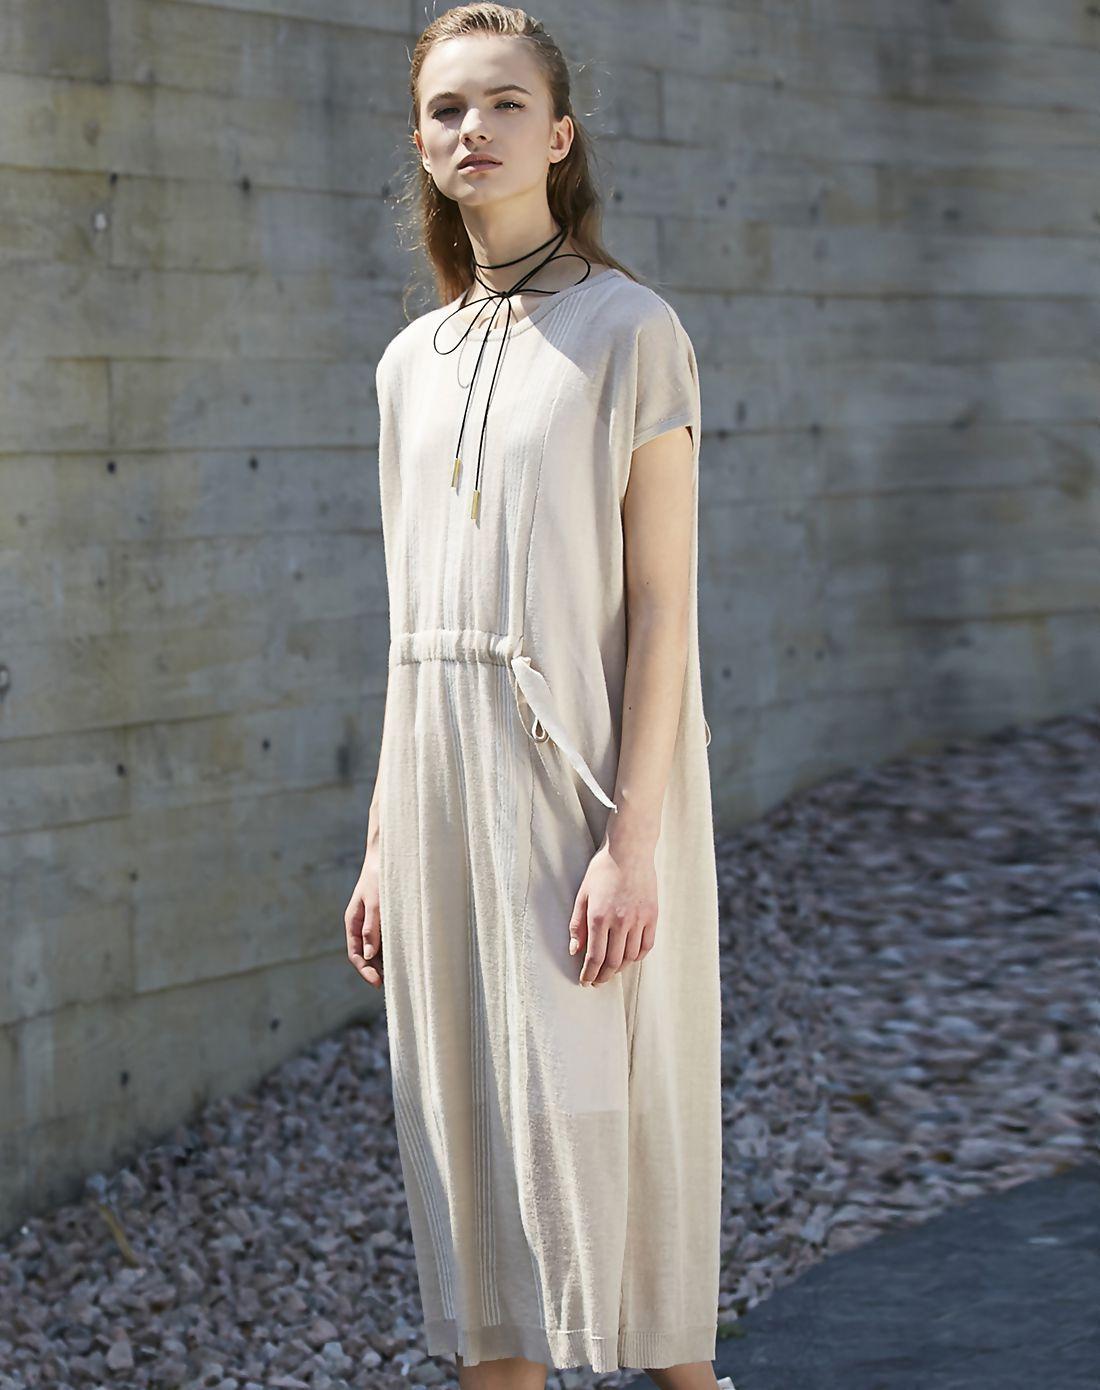 #AdoreWe #VIPme Shift Dresses - Designer SIKYA Beige Striped Belted Knitted Midi Dress - AdoreWe.com